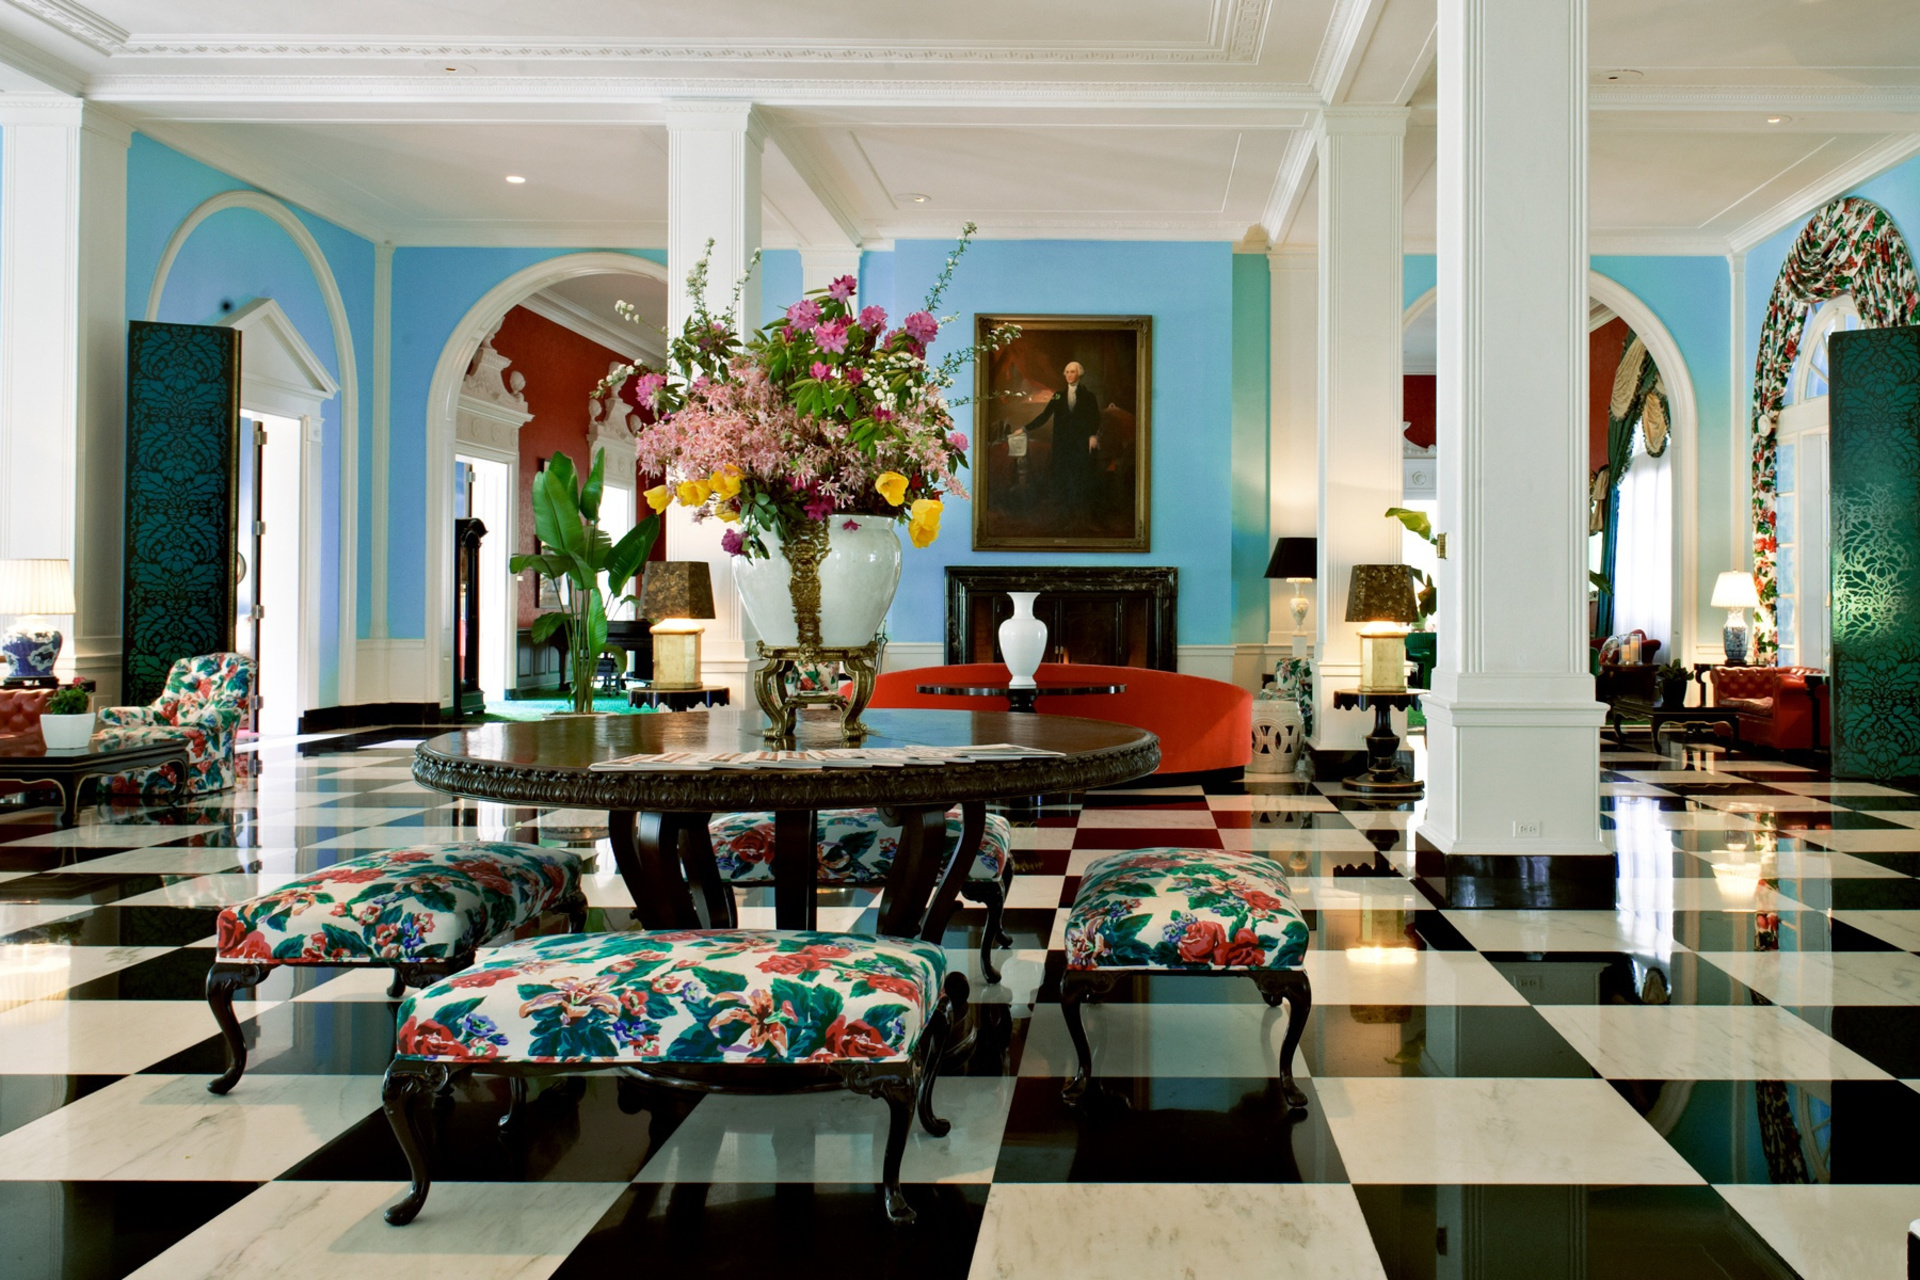 Lobby in The Greenbrier, Michael Arnaud / Courtesy of Dorothy Draper & Company, inc.